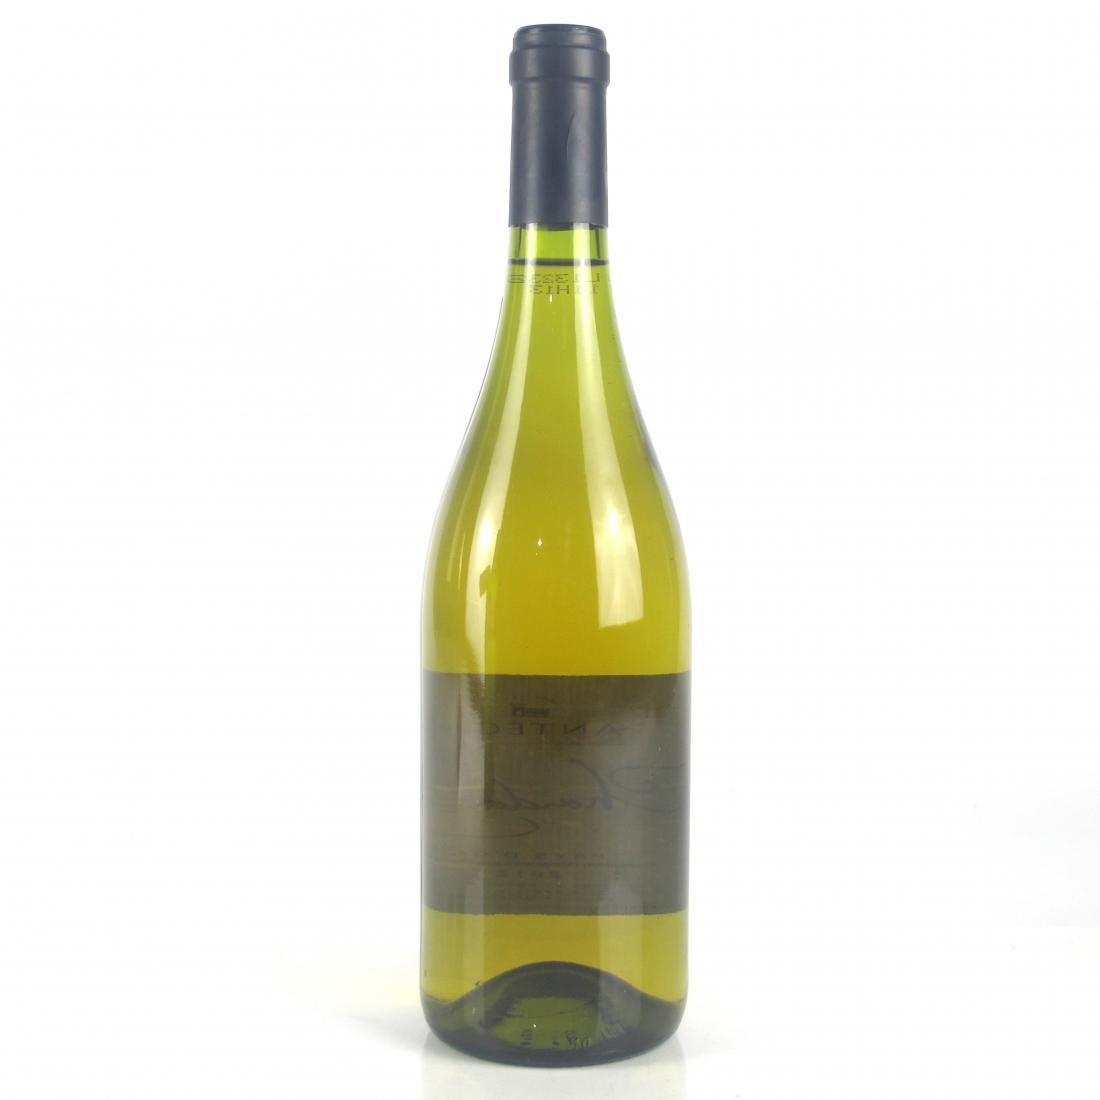 Antech Chardonnay 2012 Pays d'Oc